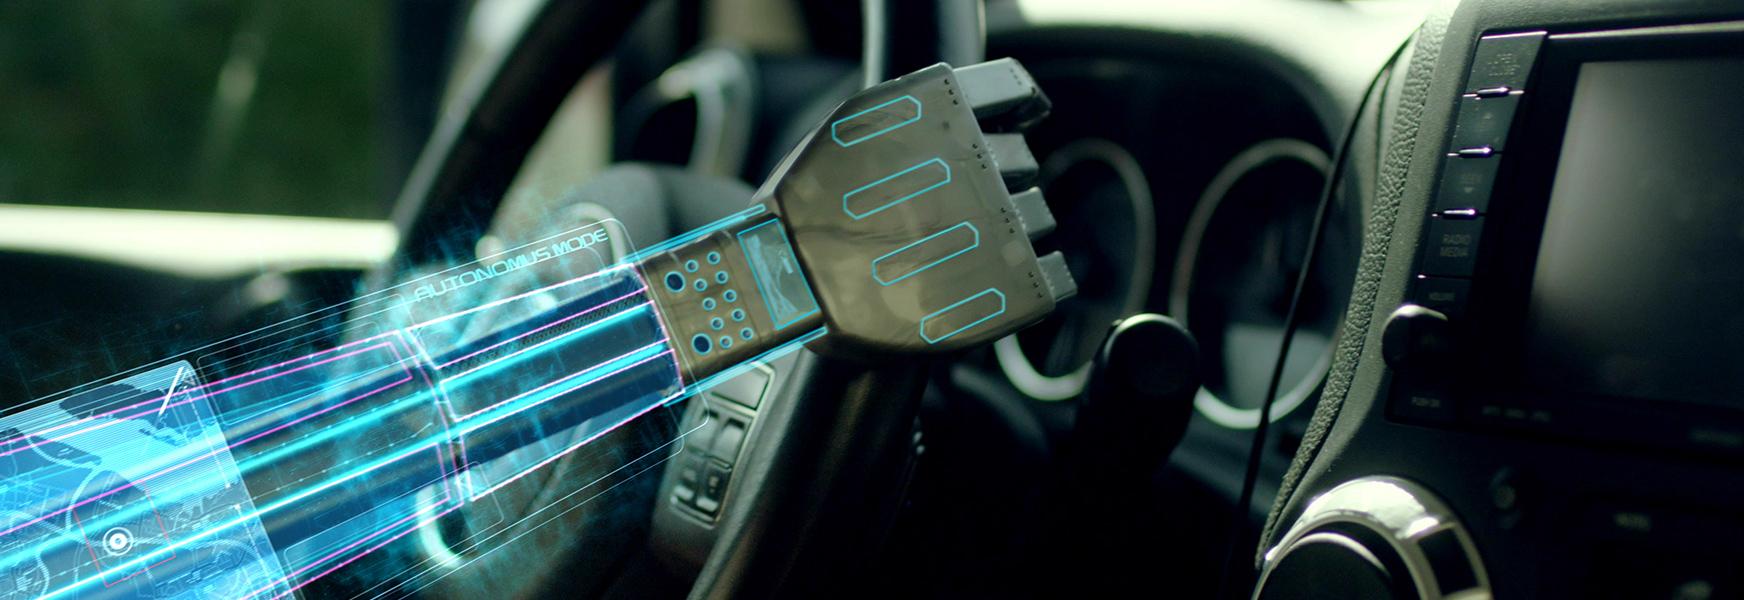 Robot holding car steering wheel